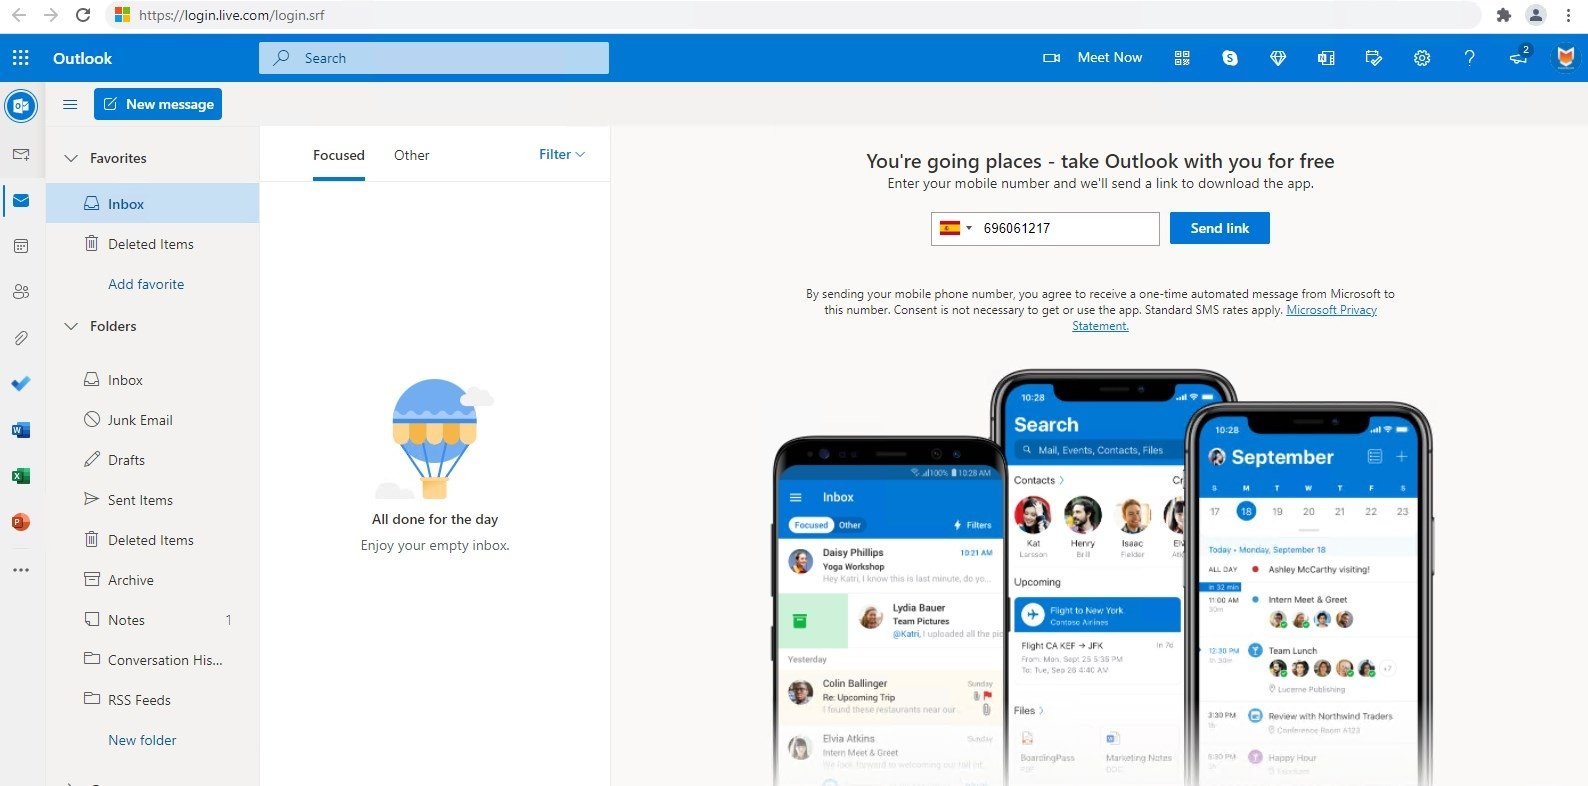 Hotmail online portugus grtis hotmail imagem 1 thumbnail hotmail imagem 2 thumbnail stopboris Choice Image